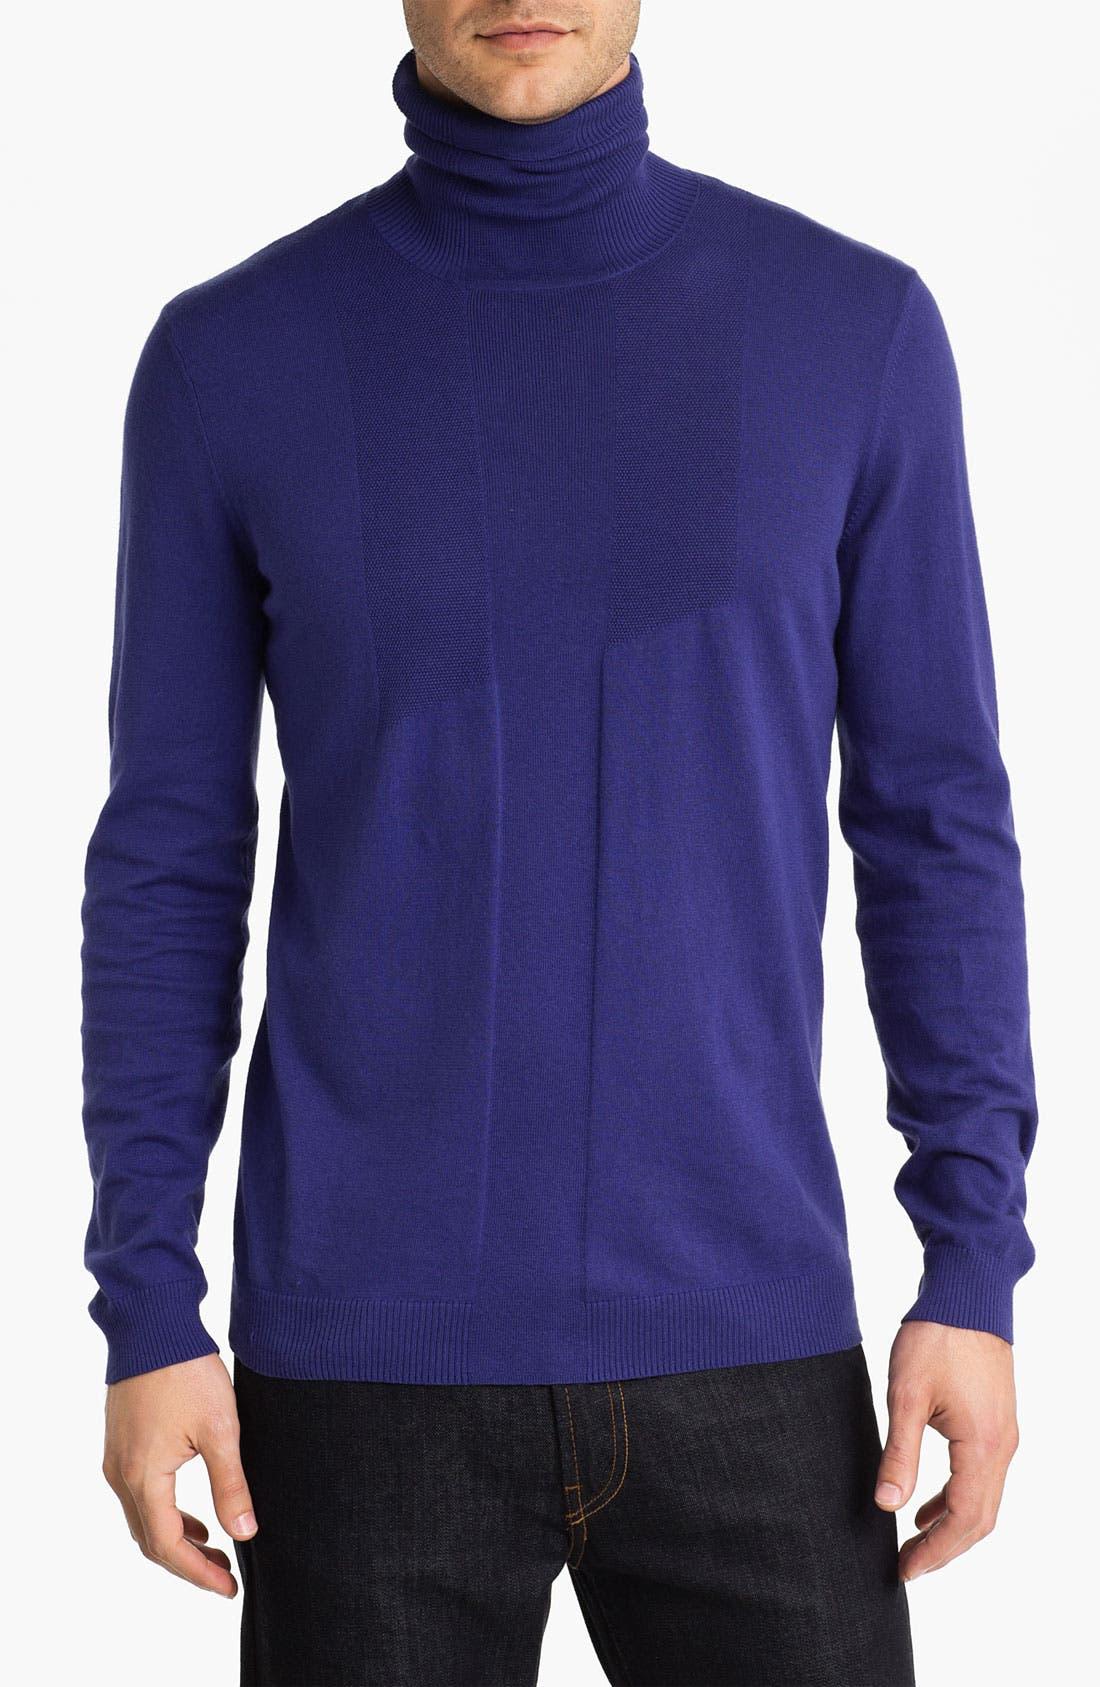 Alternate Image 1 Selected - HUGO 'Storte' Turtleneck Sweater